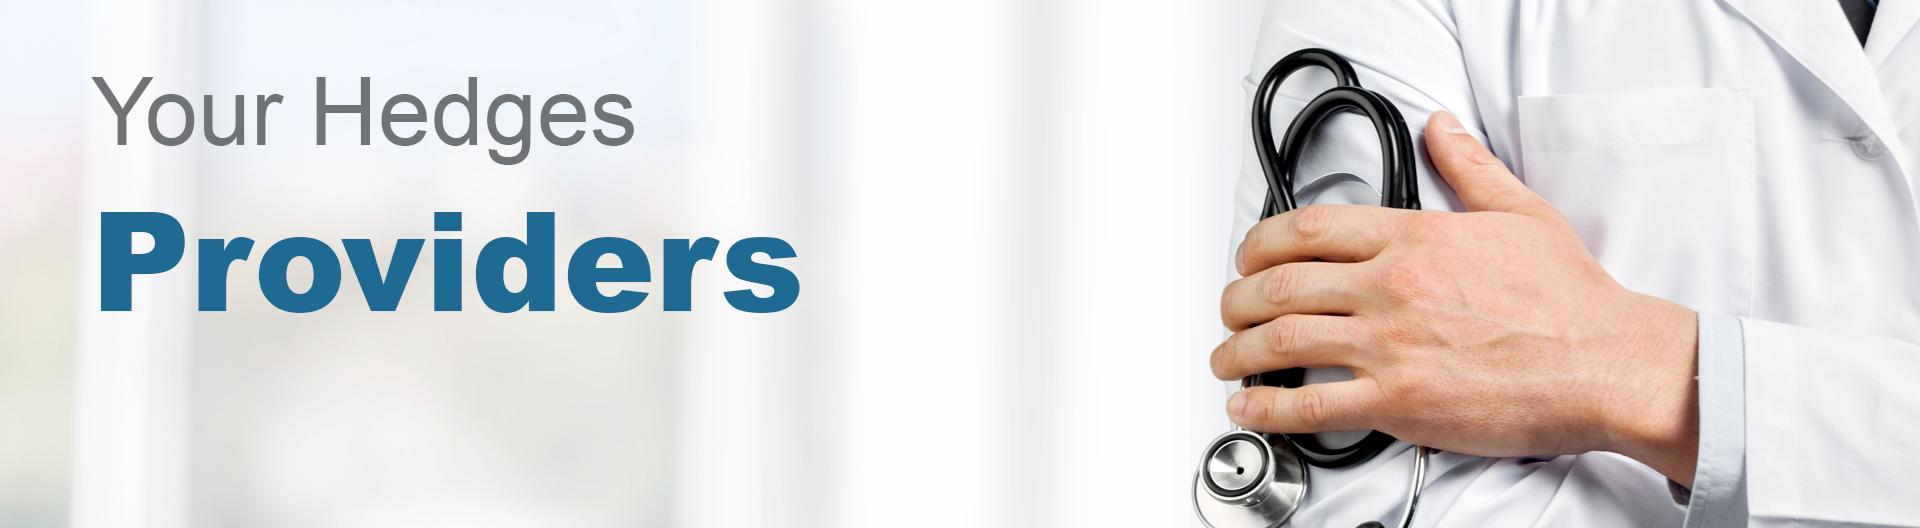 Providers_Header2